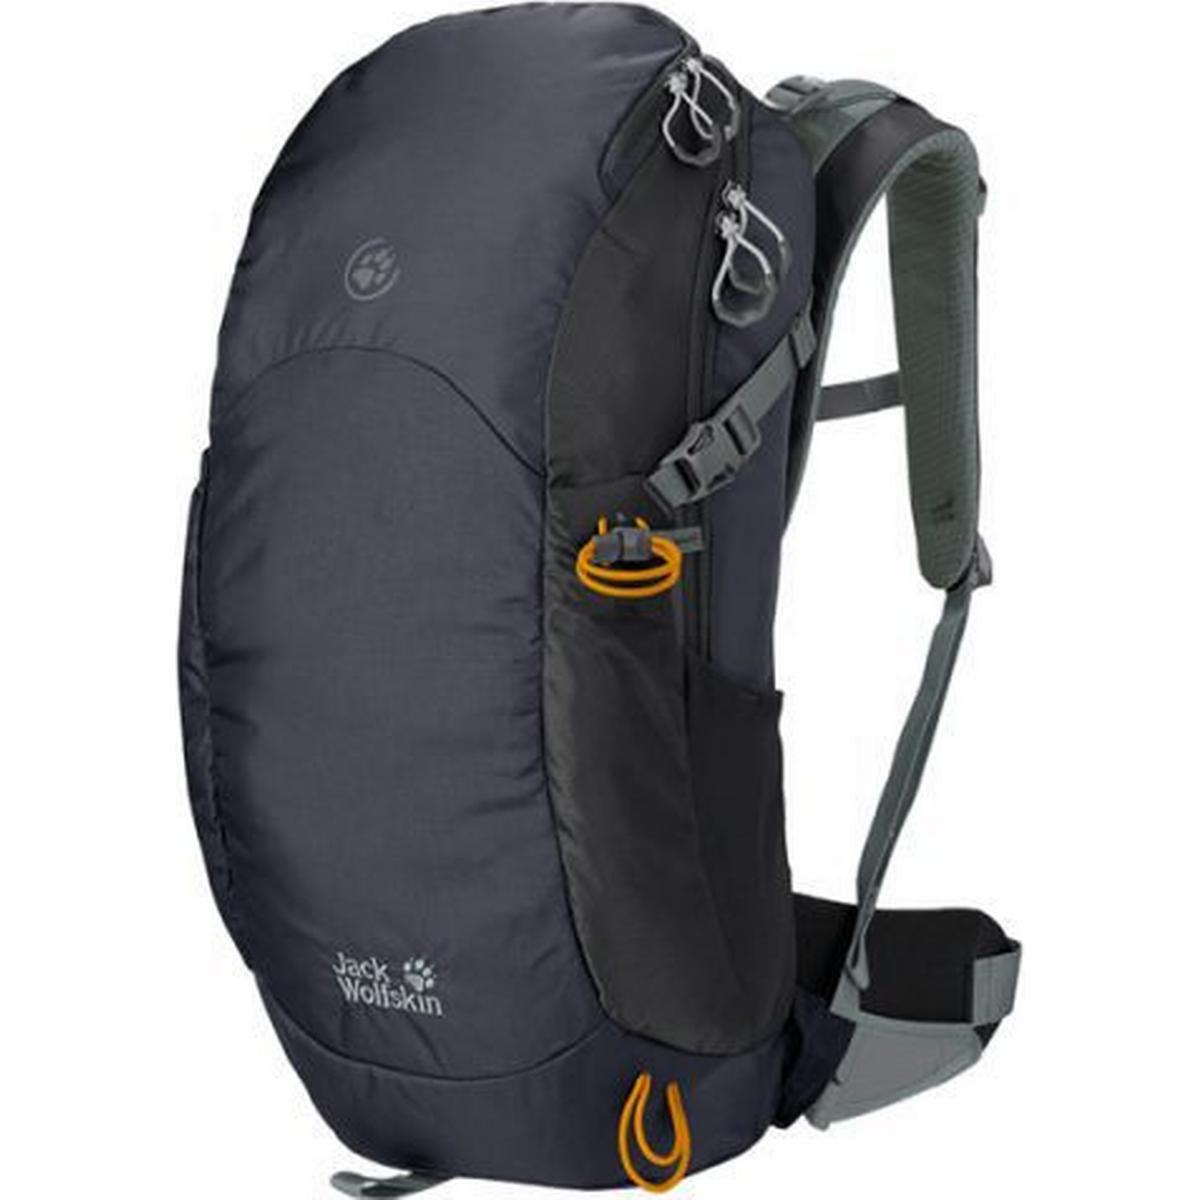 Jack Wolfskin Ryggsäckar (300+ produkter) • Se billigste